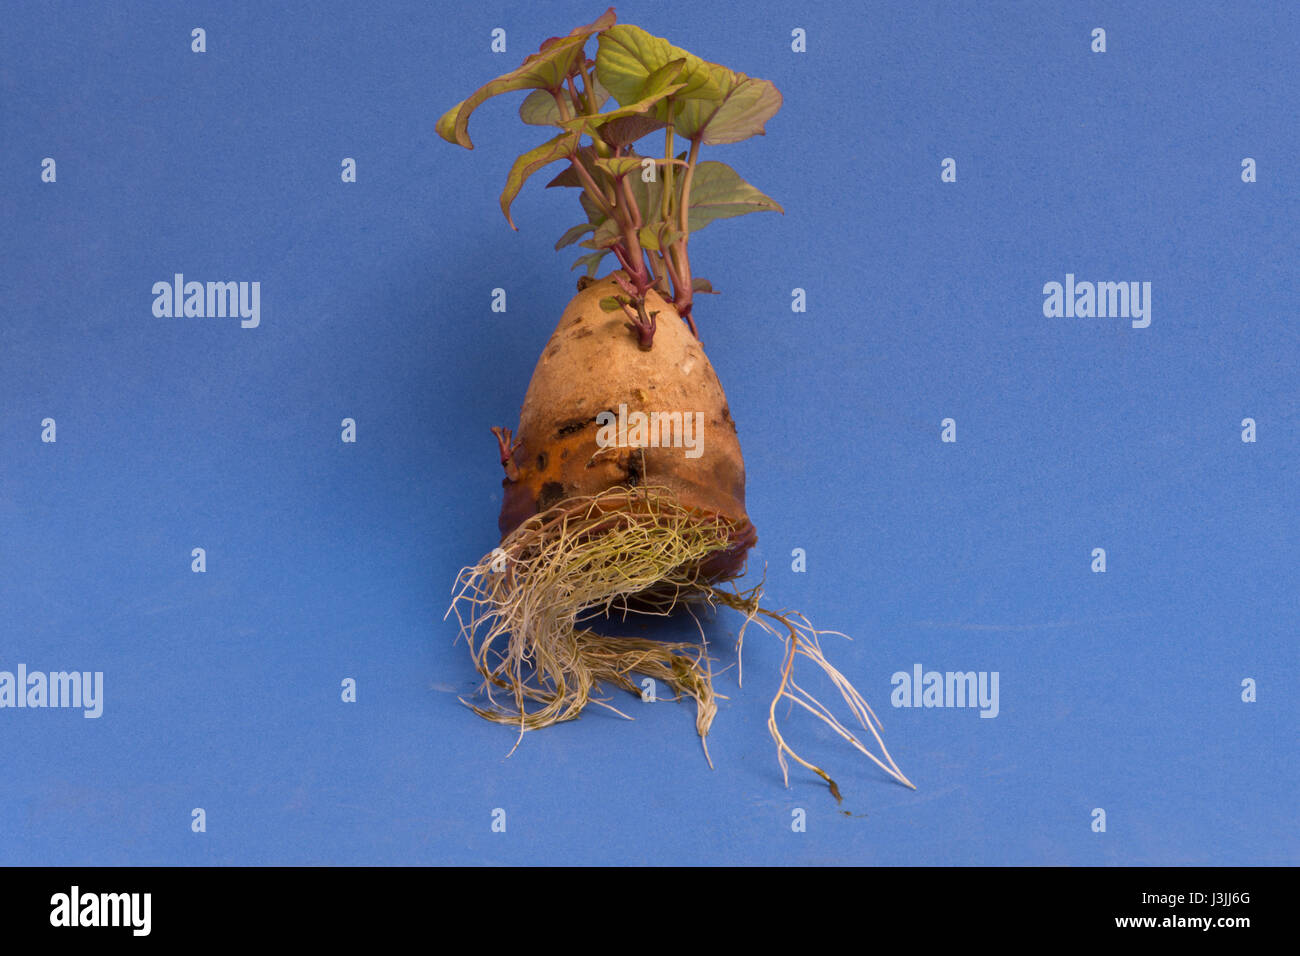 Erste Ausbaustufe Süßkartoffel slip Stockbild